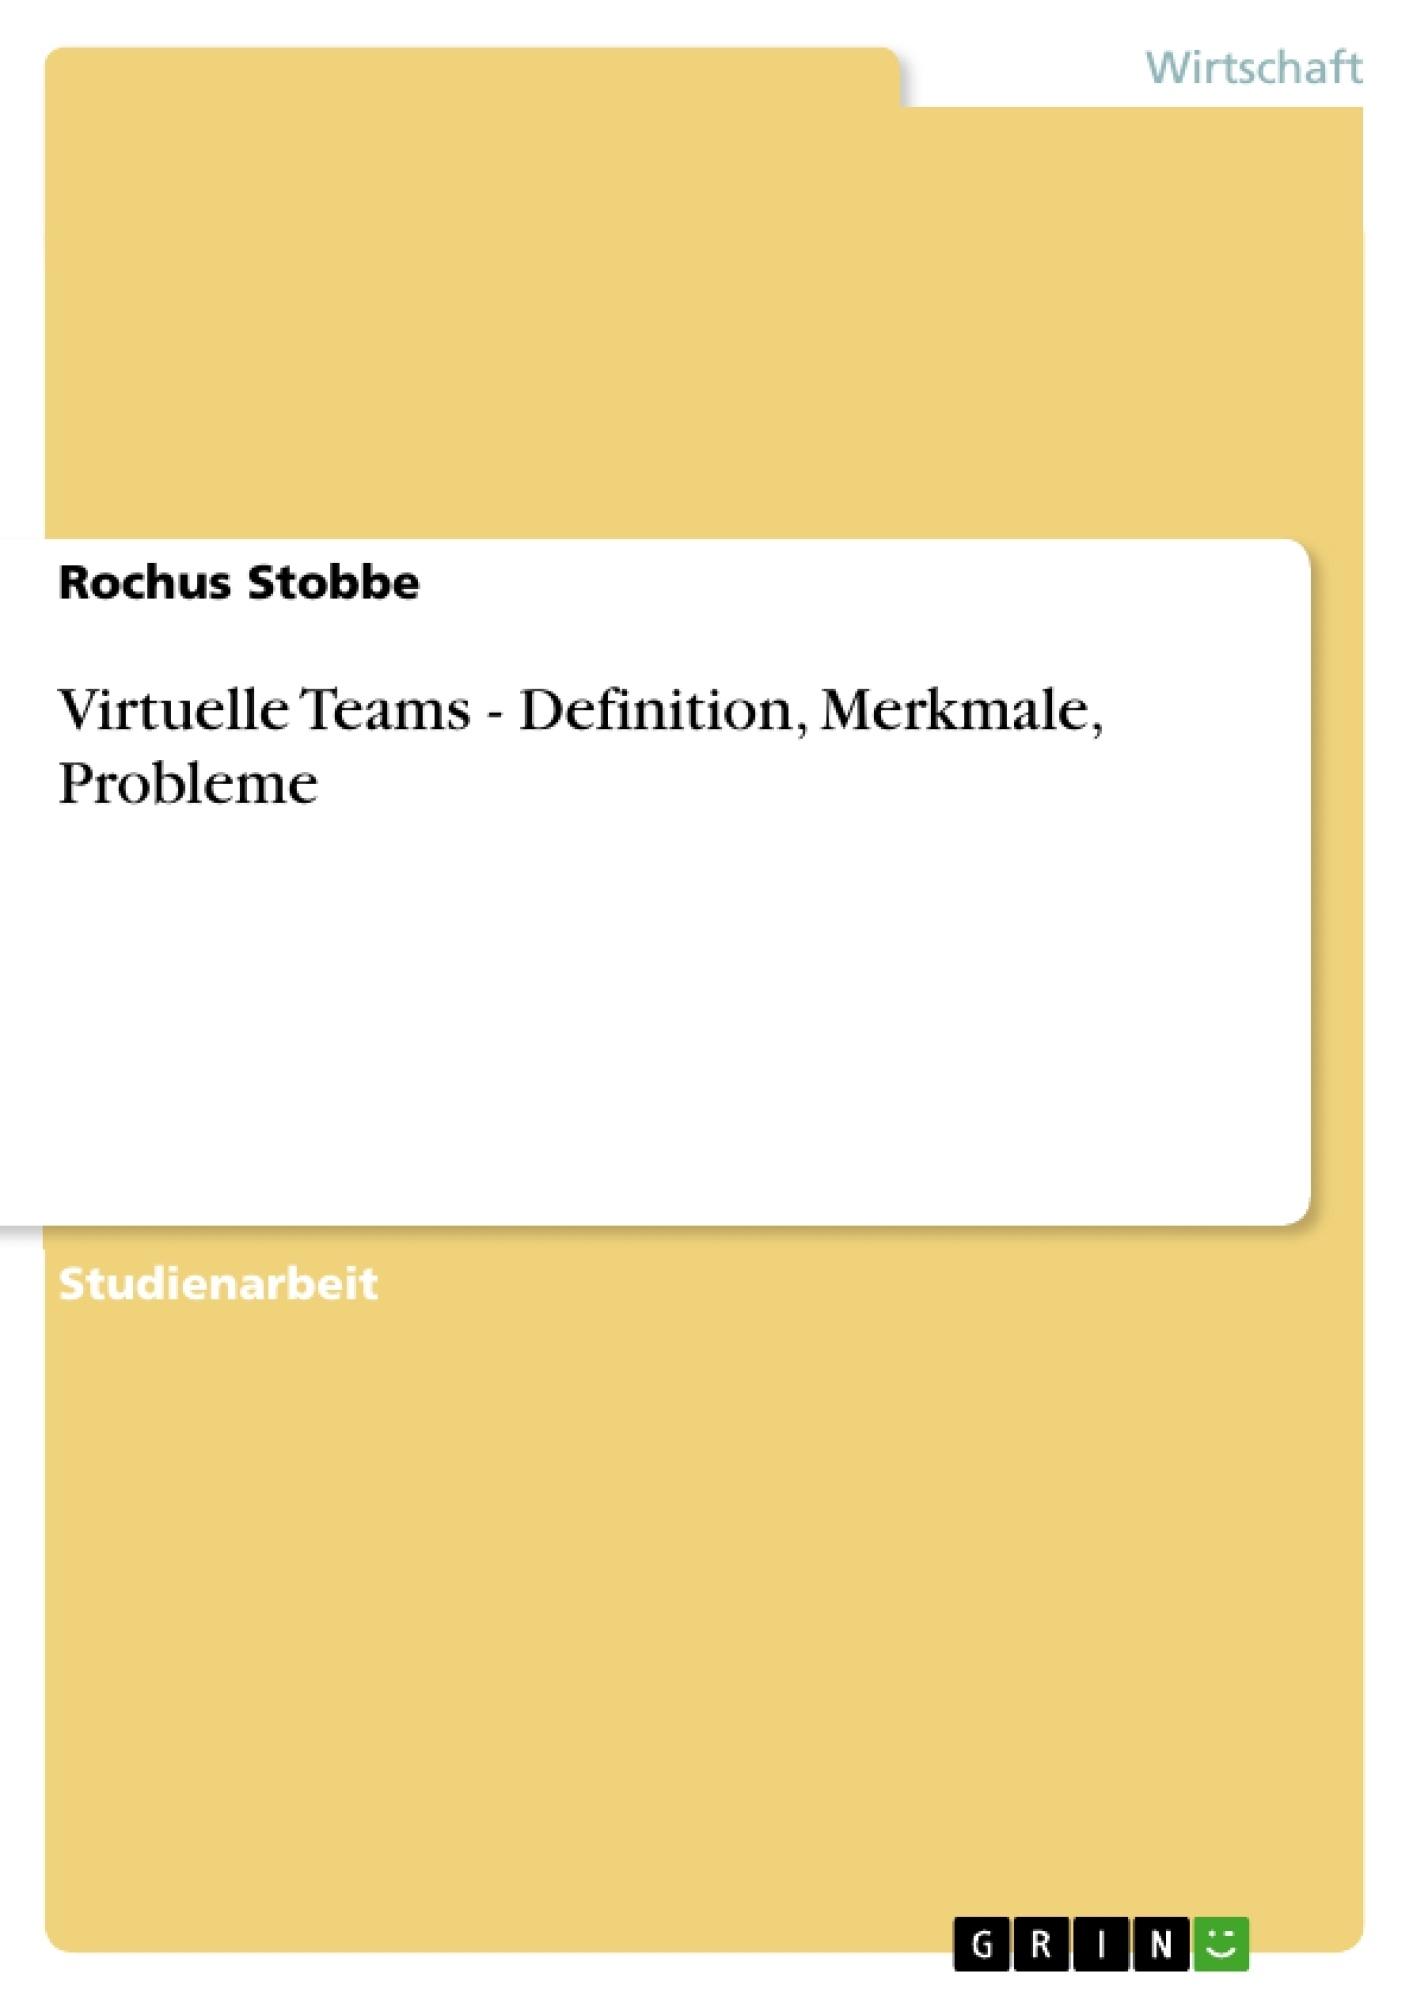 Titel: Virtuelle Teams - Definition, Merkmale, Probleme